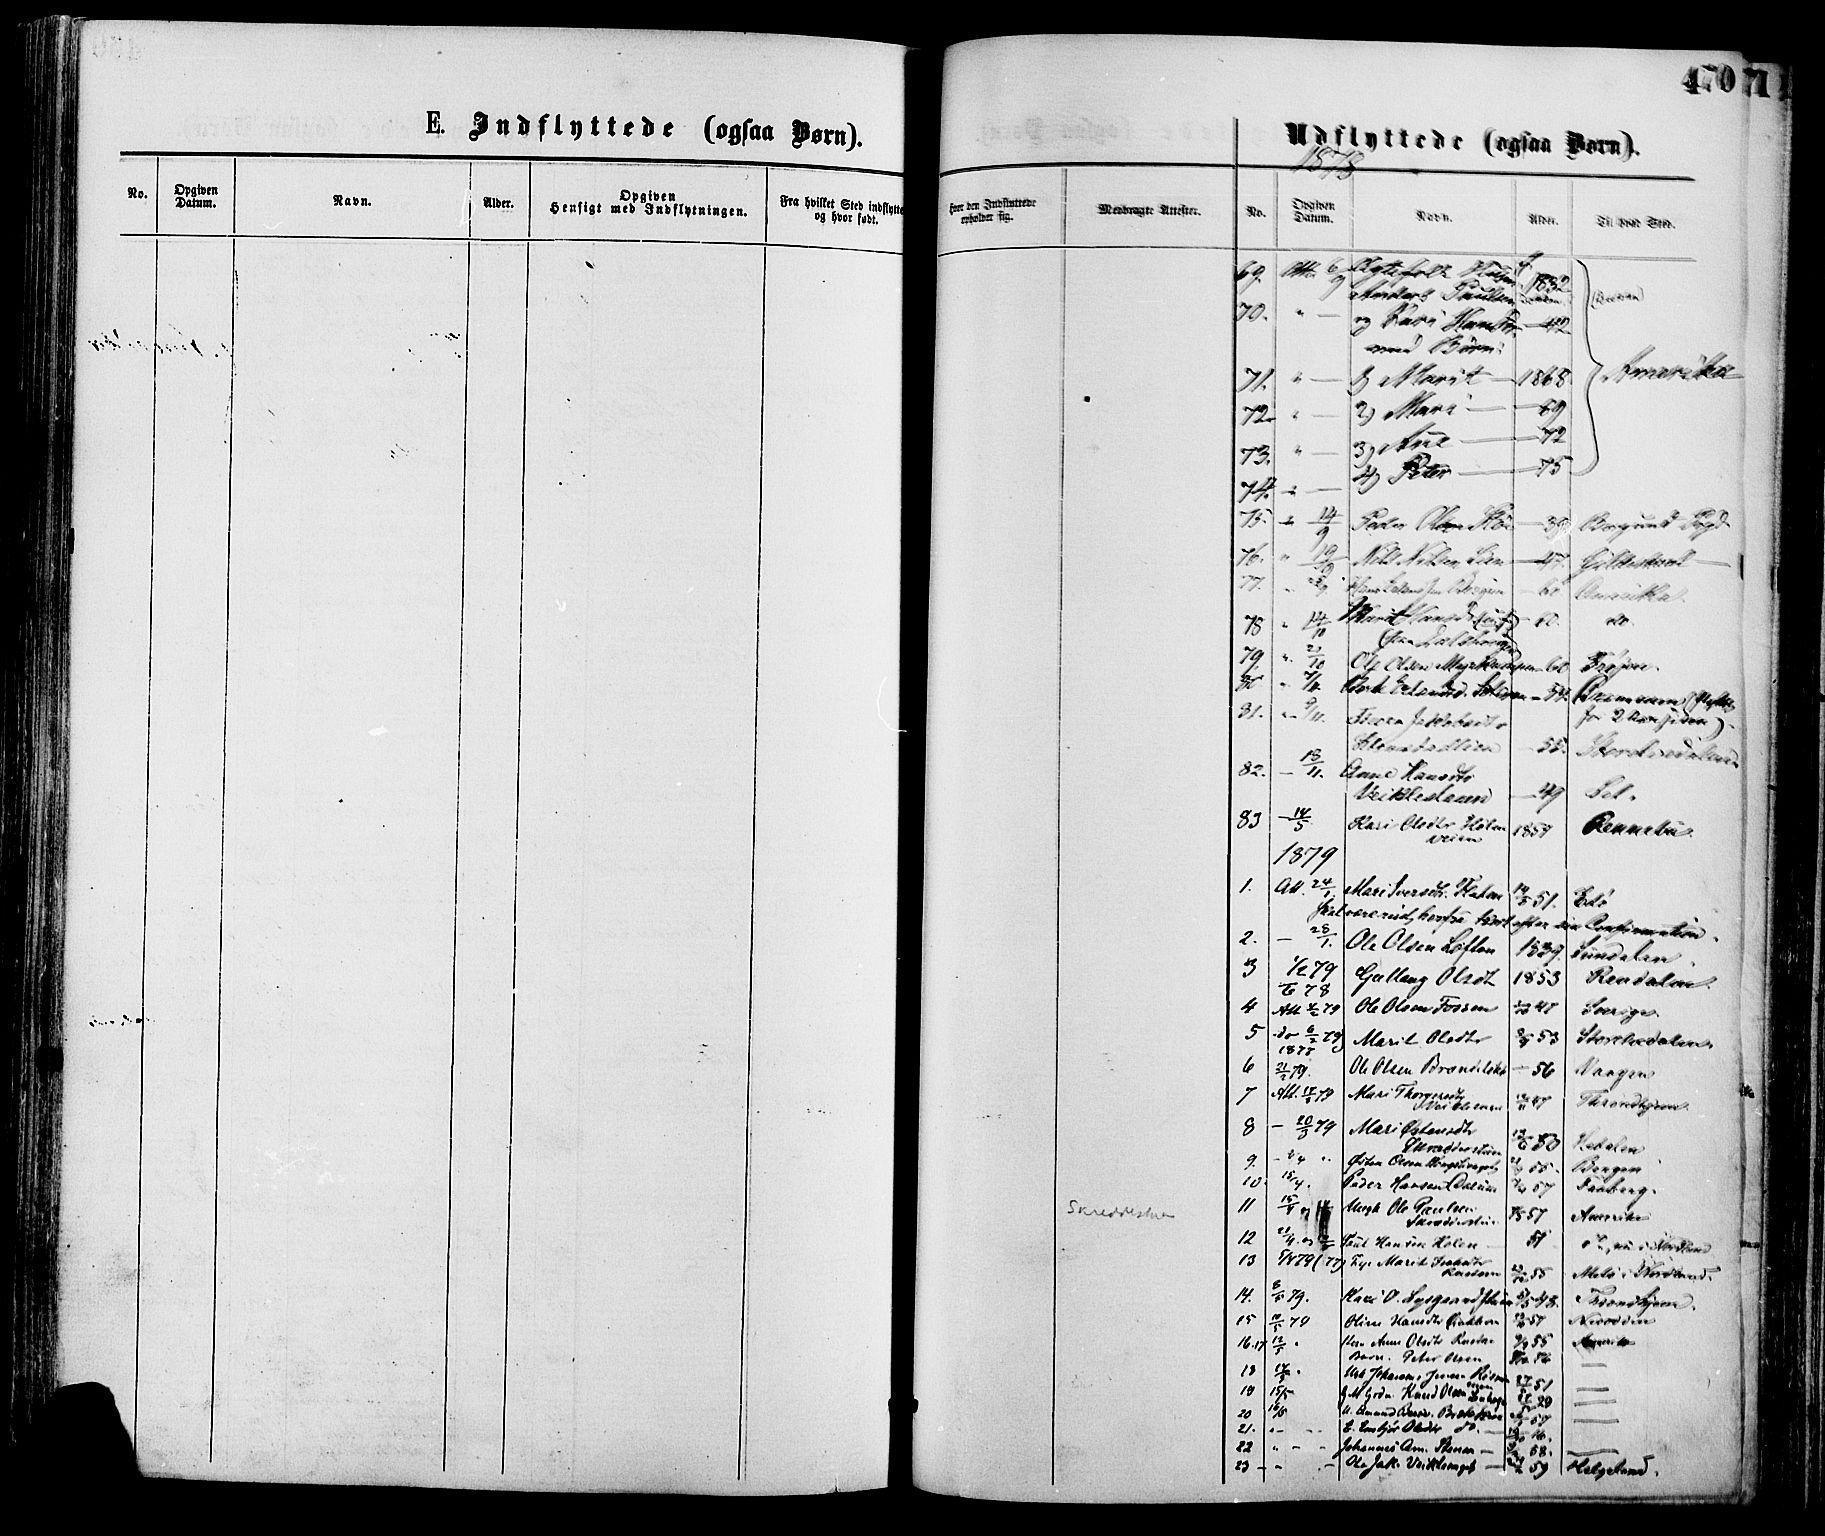 SAH, Nord-Fron prestekontor, Ministerialbok nr. 2, 1865-1883, s. 470